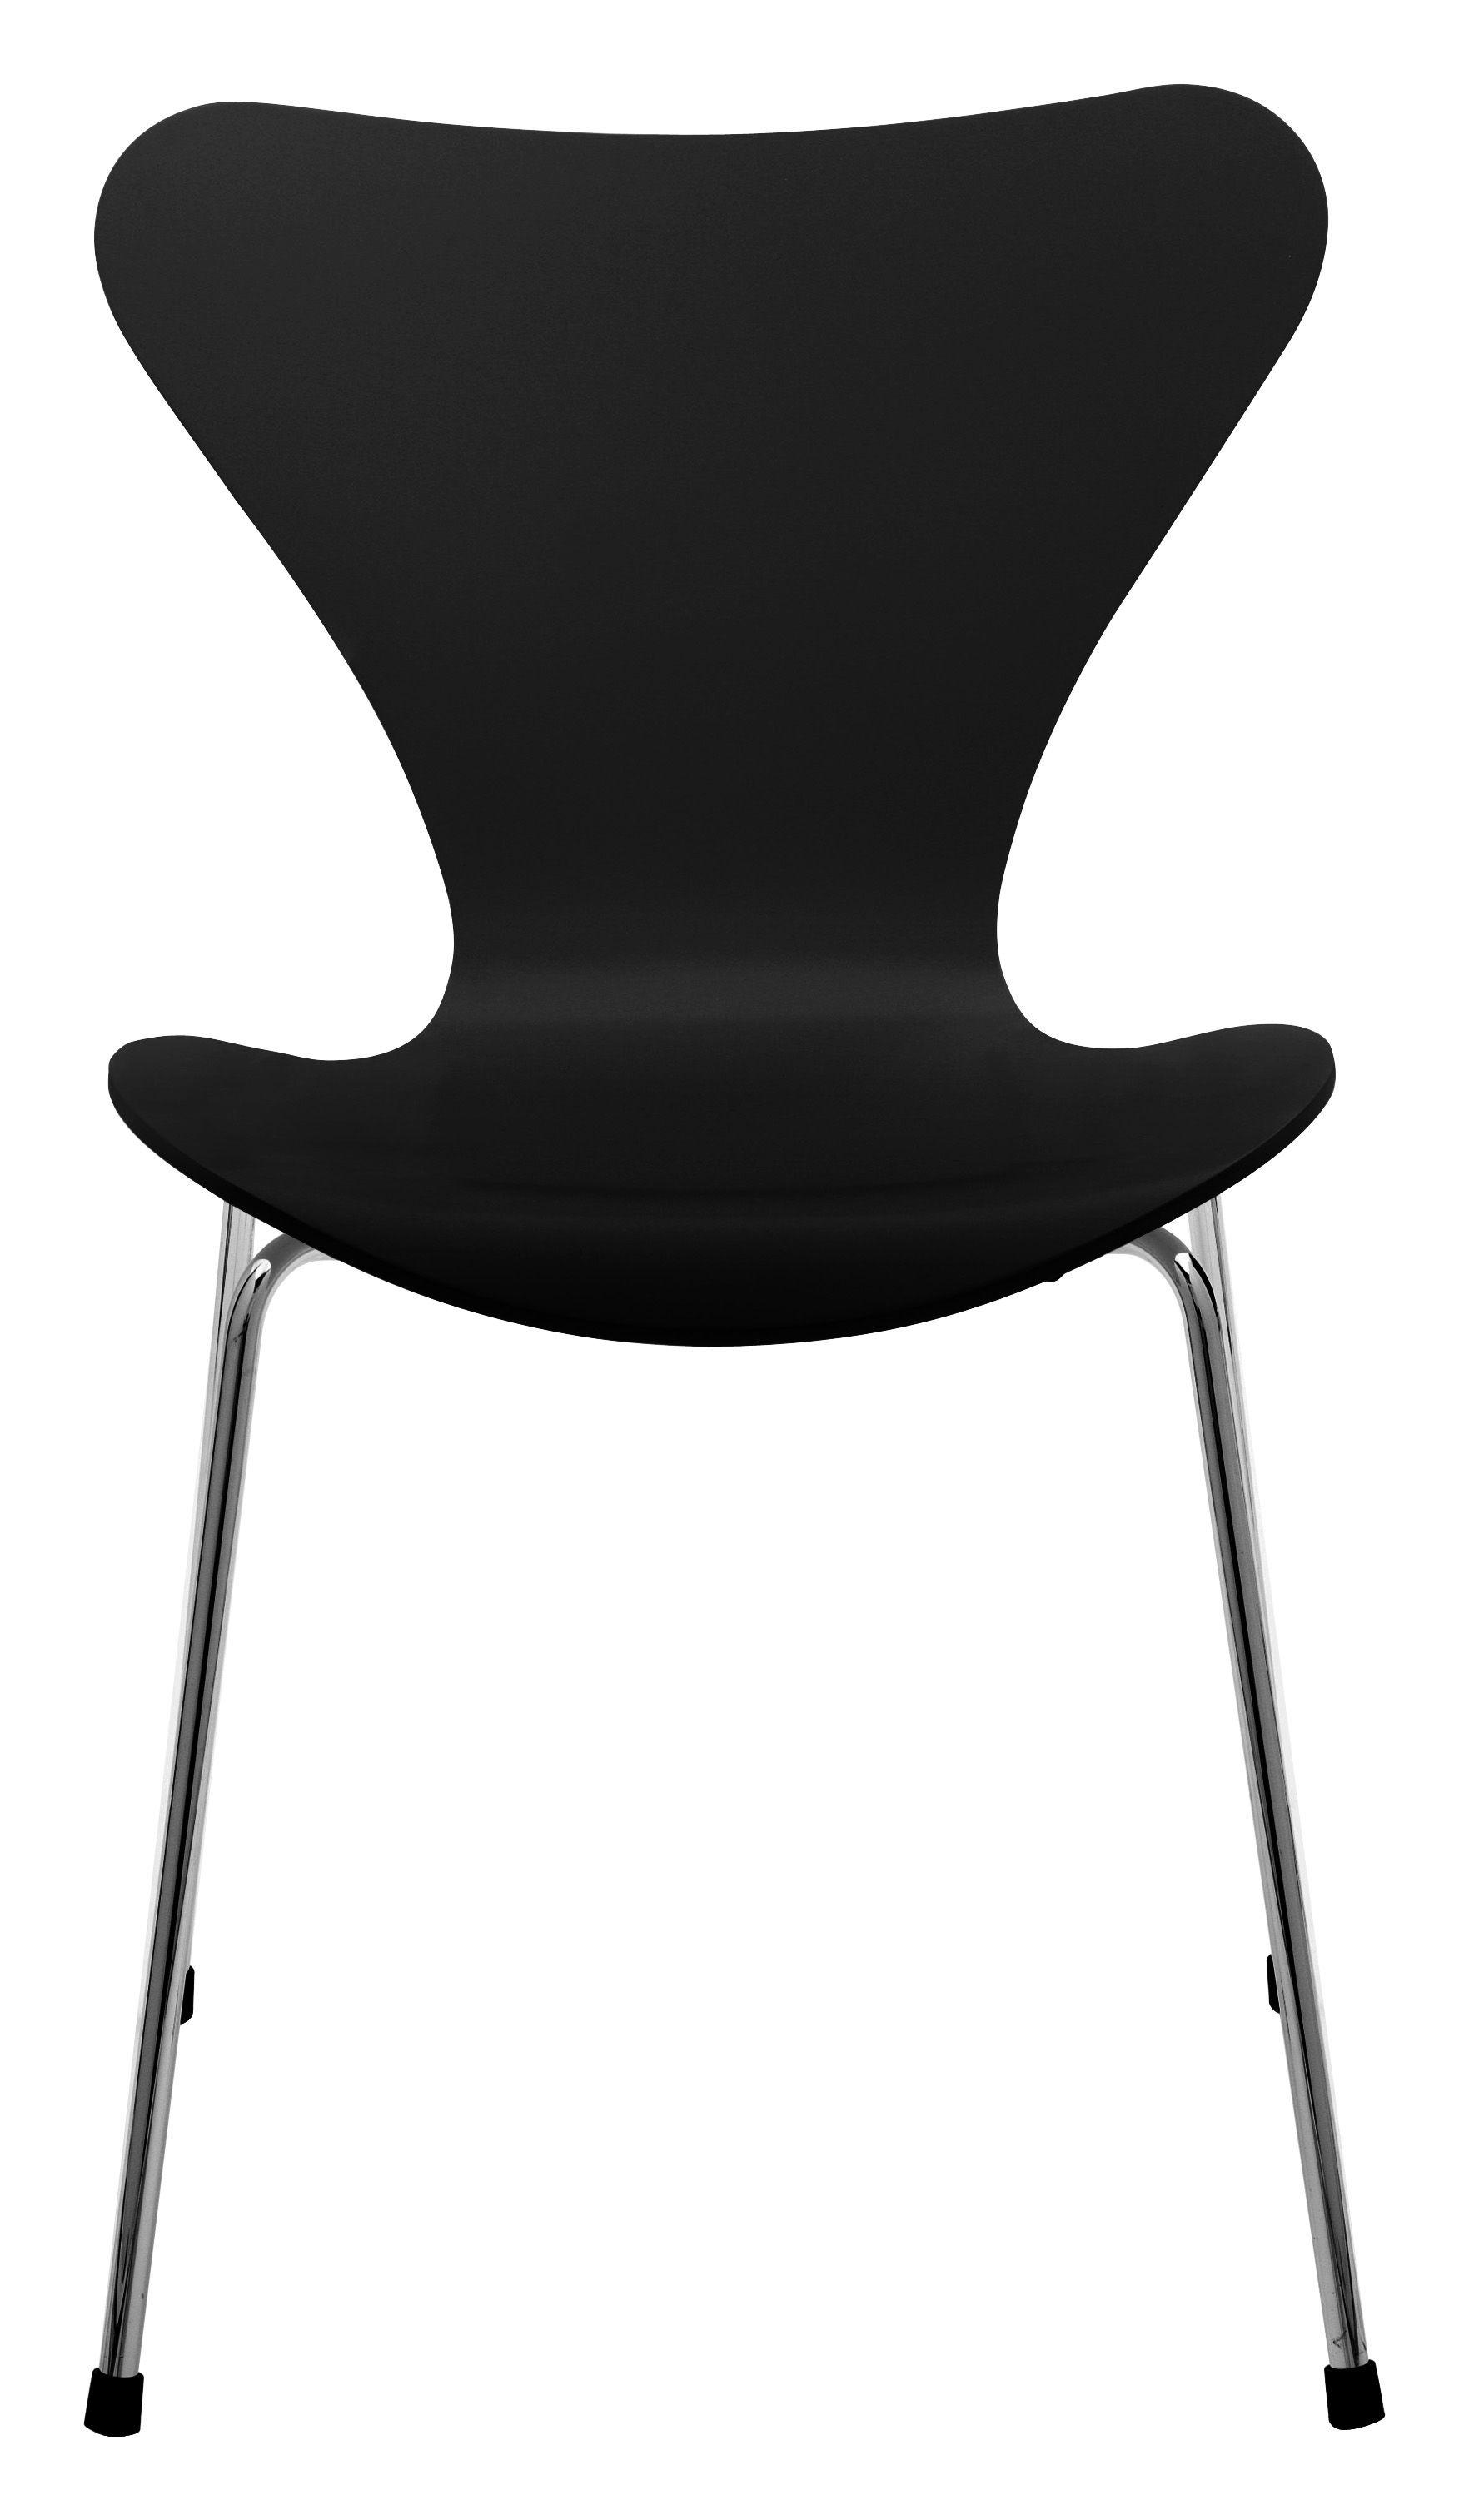 chaise empilable s rie 7 version h tre noir fritz hansen made in design. Black Bedroom Furniture Sets. Home Design Ideas